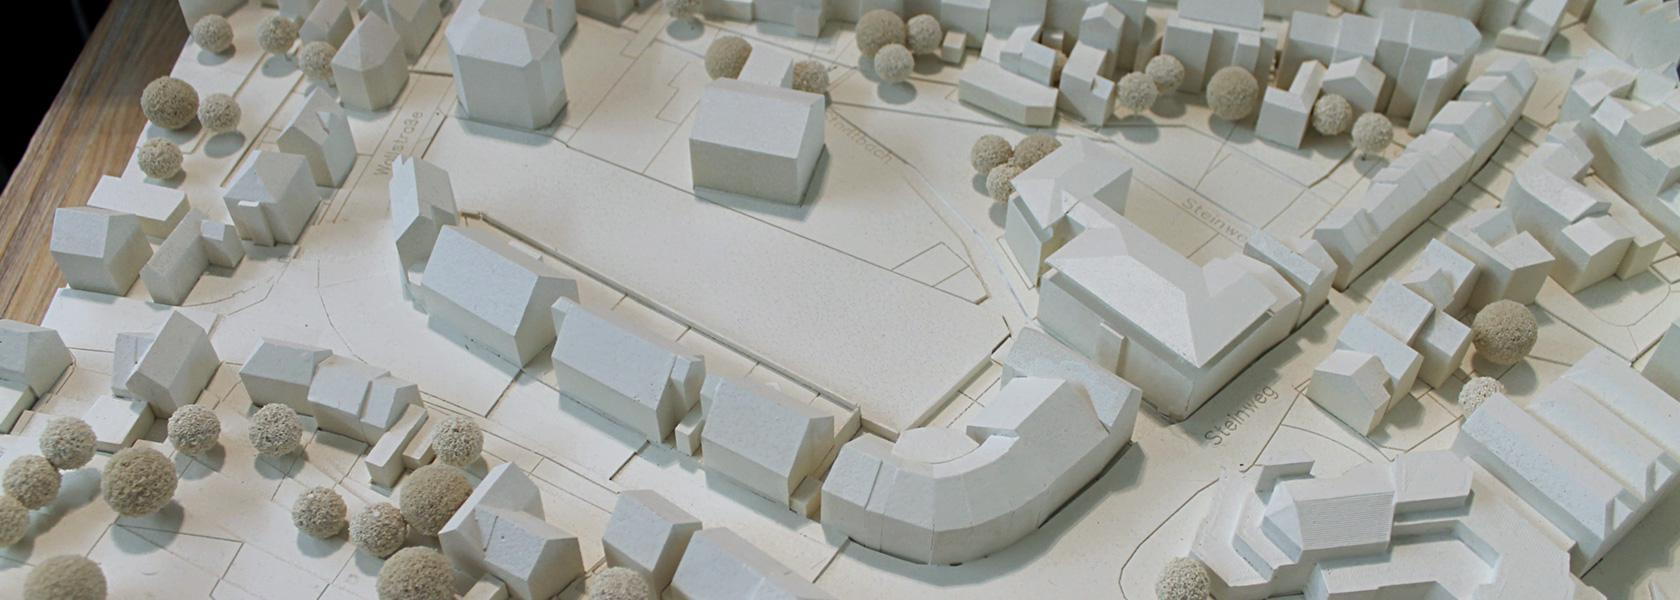 Plankomodell Grundstück